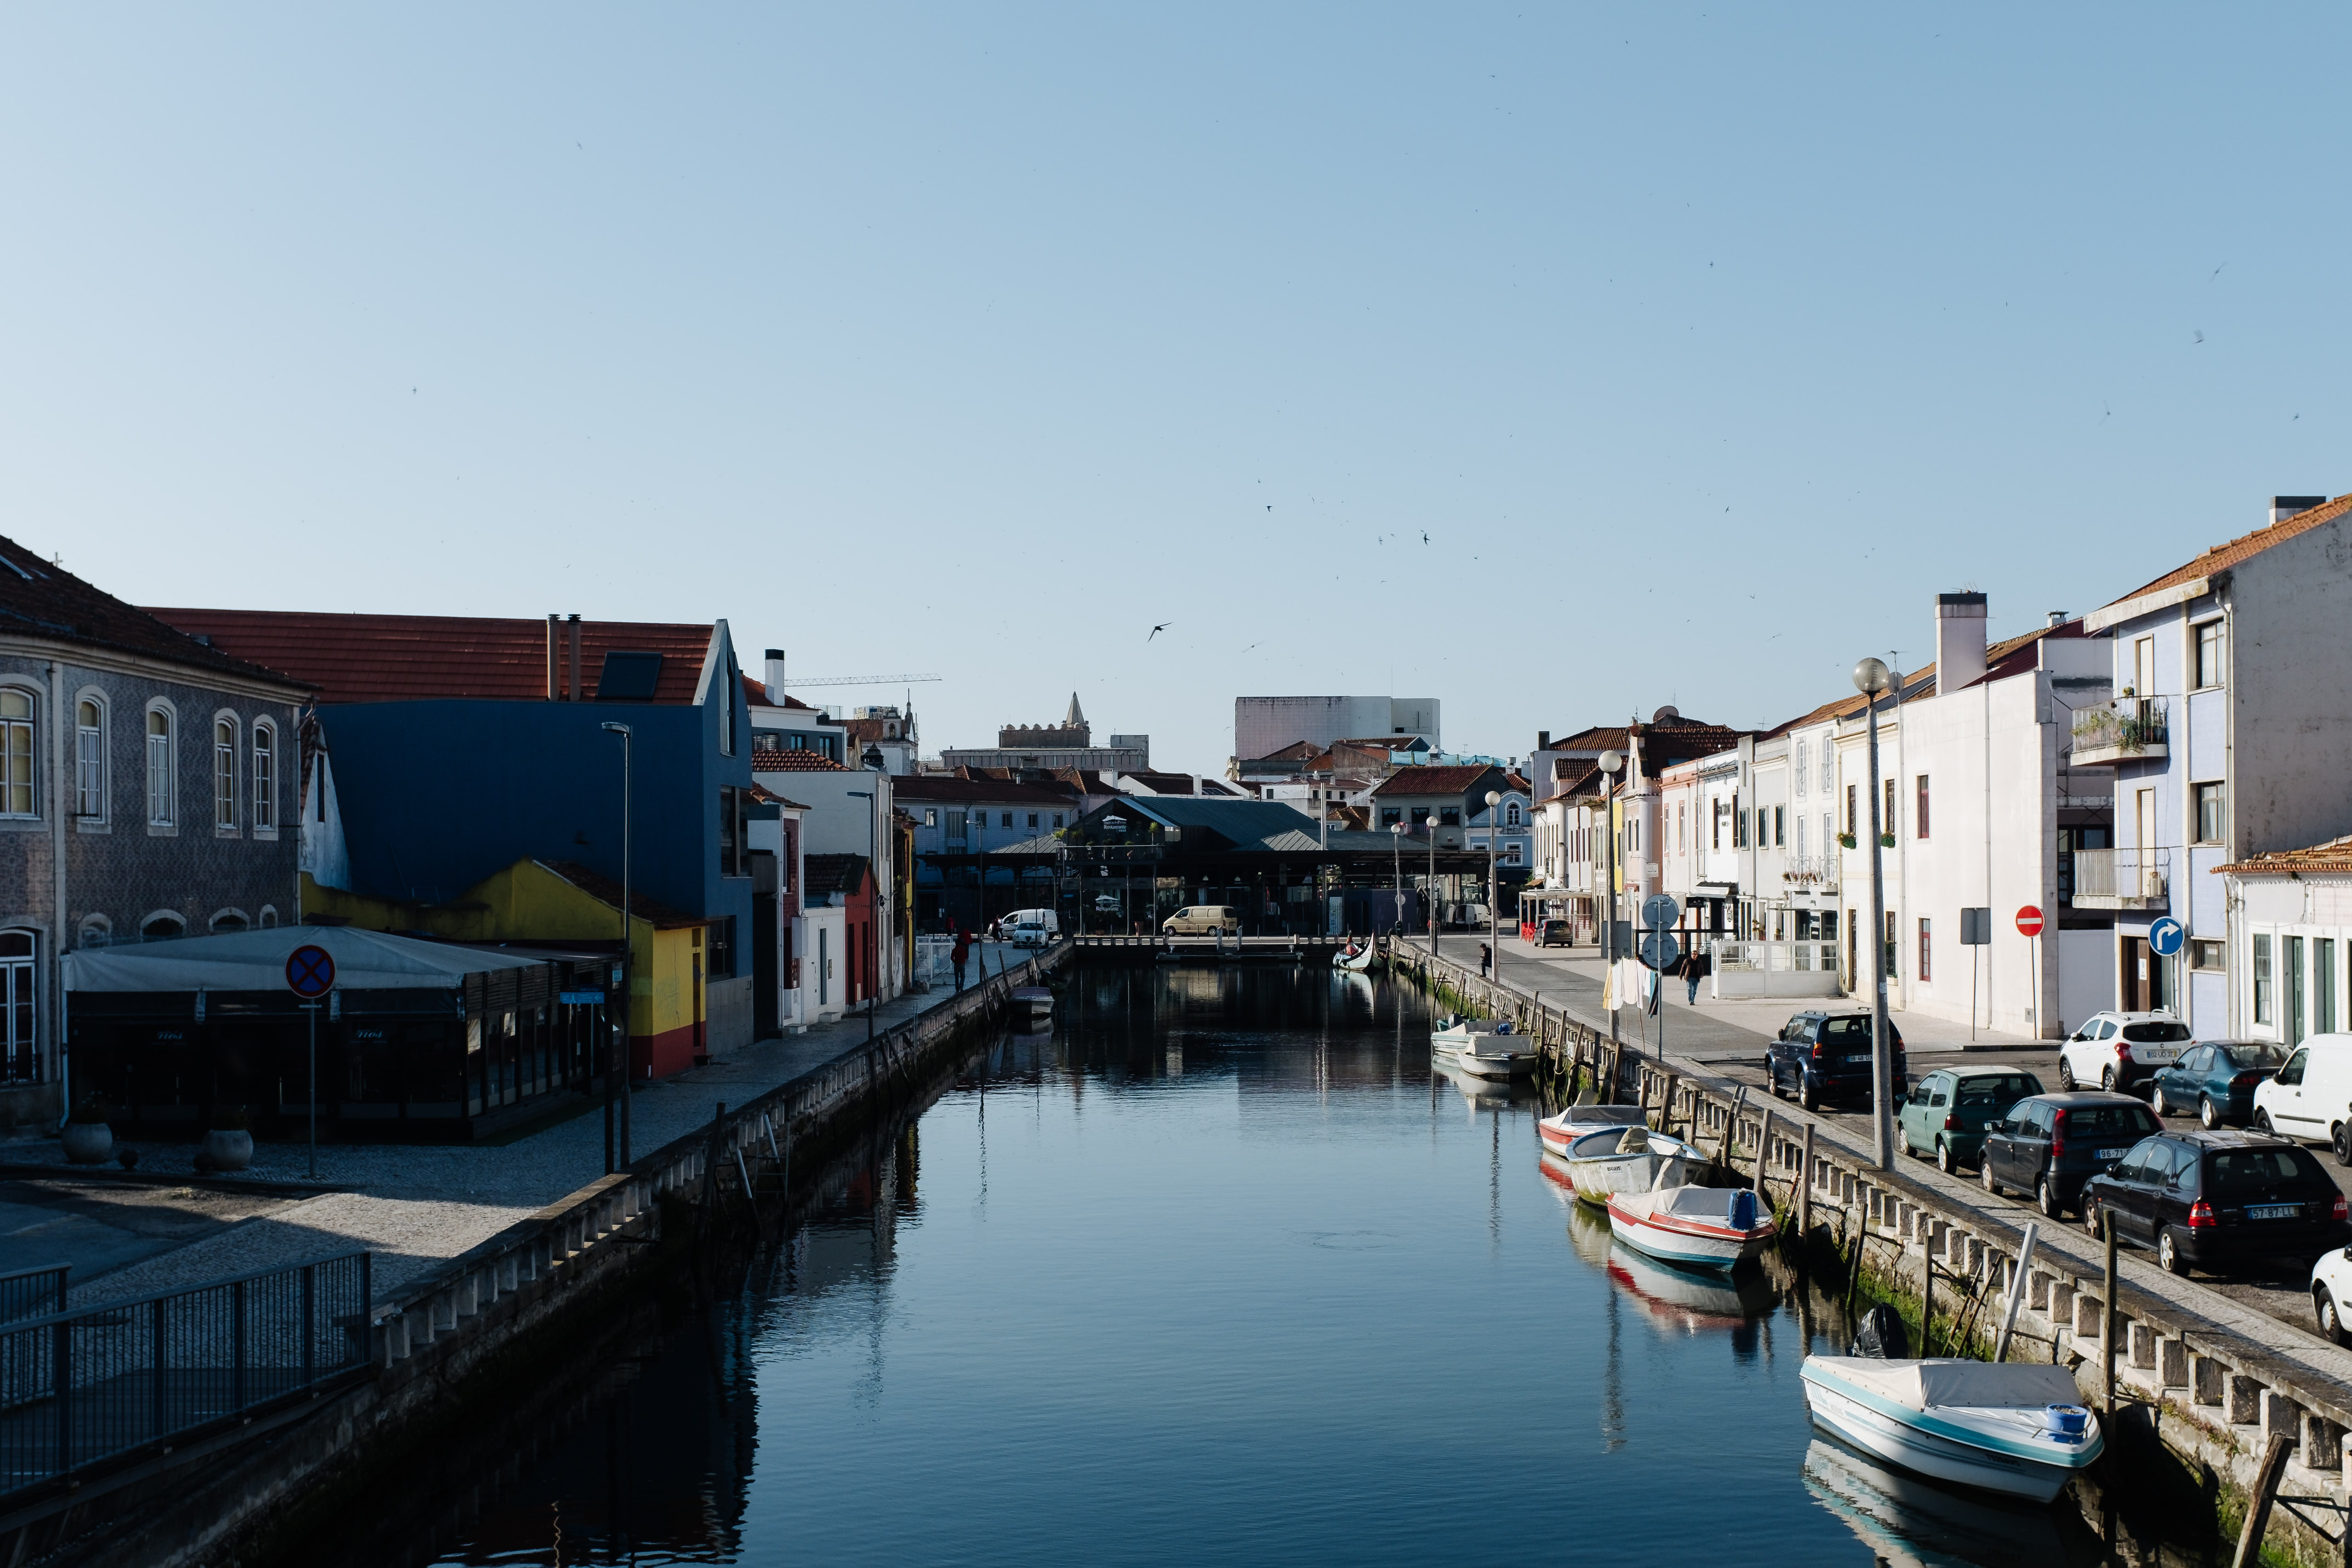 O projeto localiza-se na cidade de Aveiro / Photo by Ricardo Resende on Unsplash